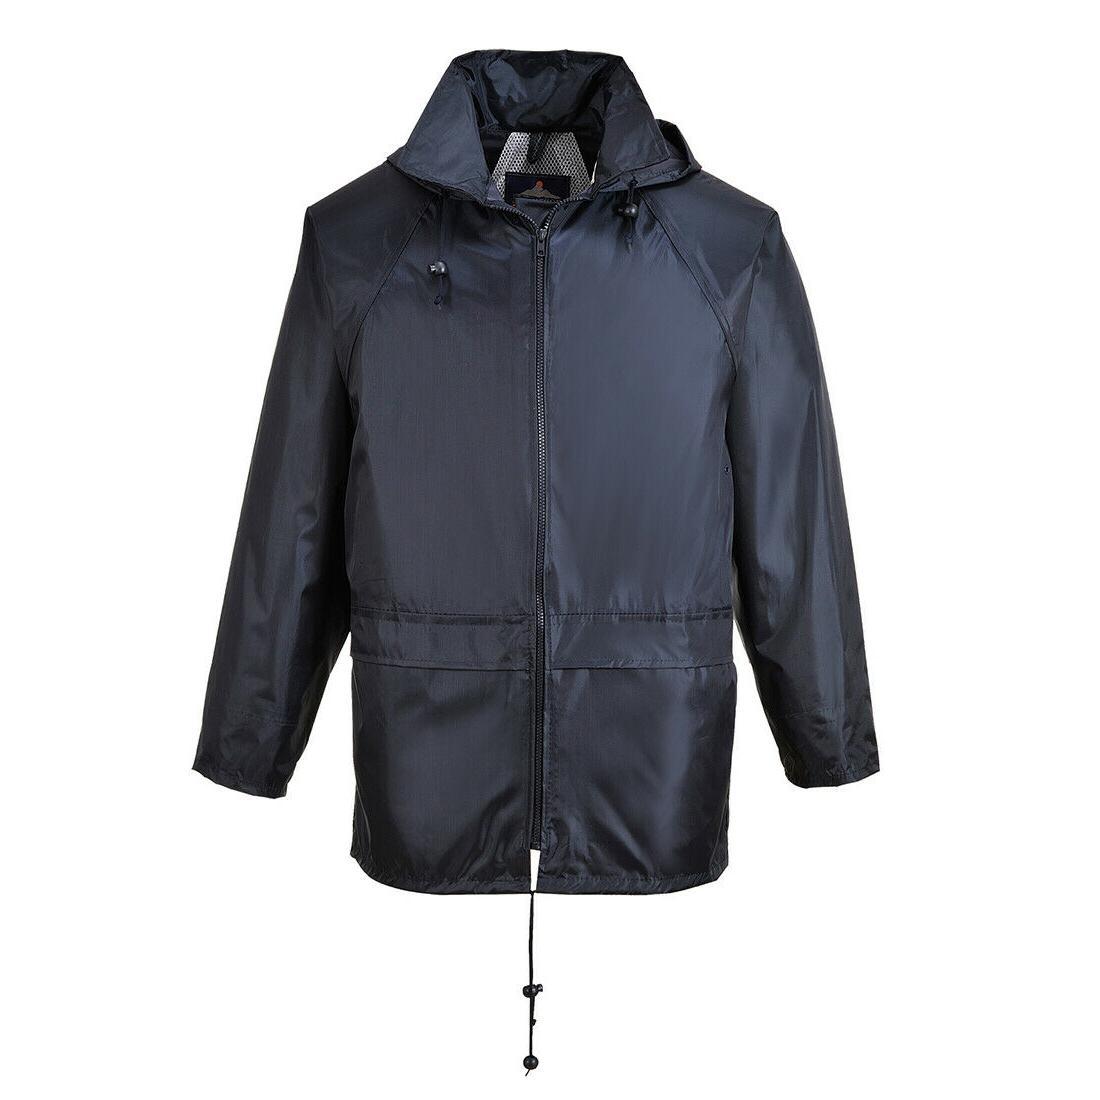 Portwest Classic Jacket - waterproof hood S-5XL